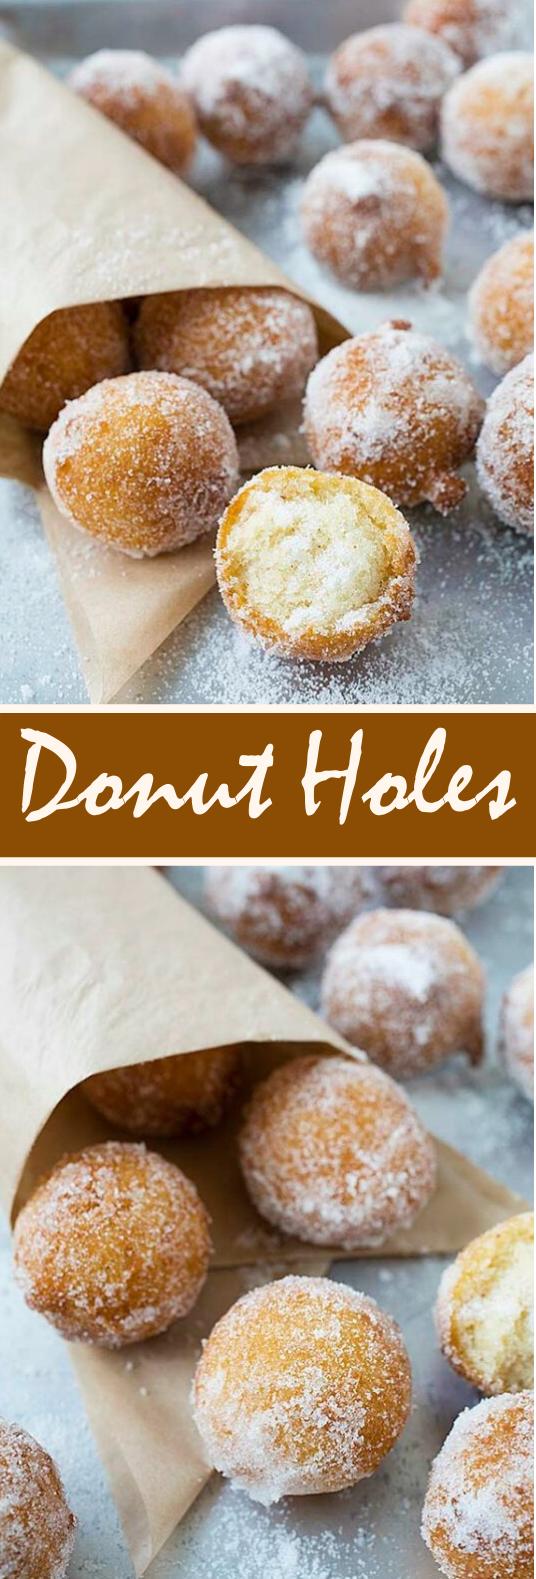 Easy Donut Holes #desserts #baking #cake #pastry #donut